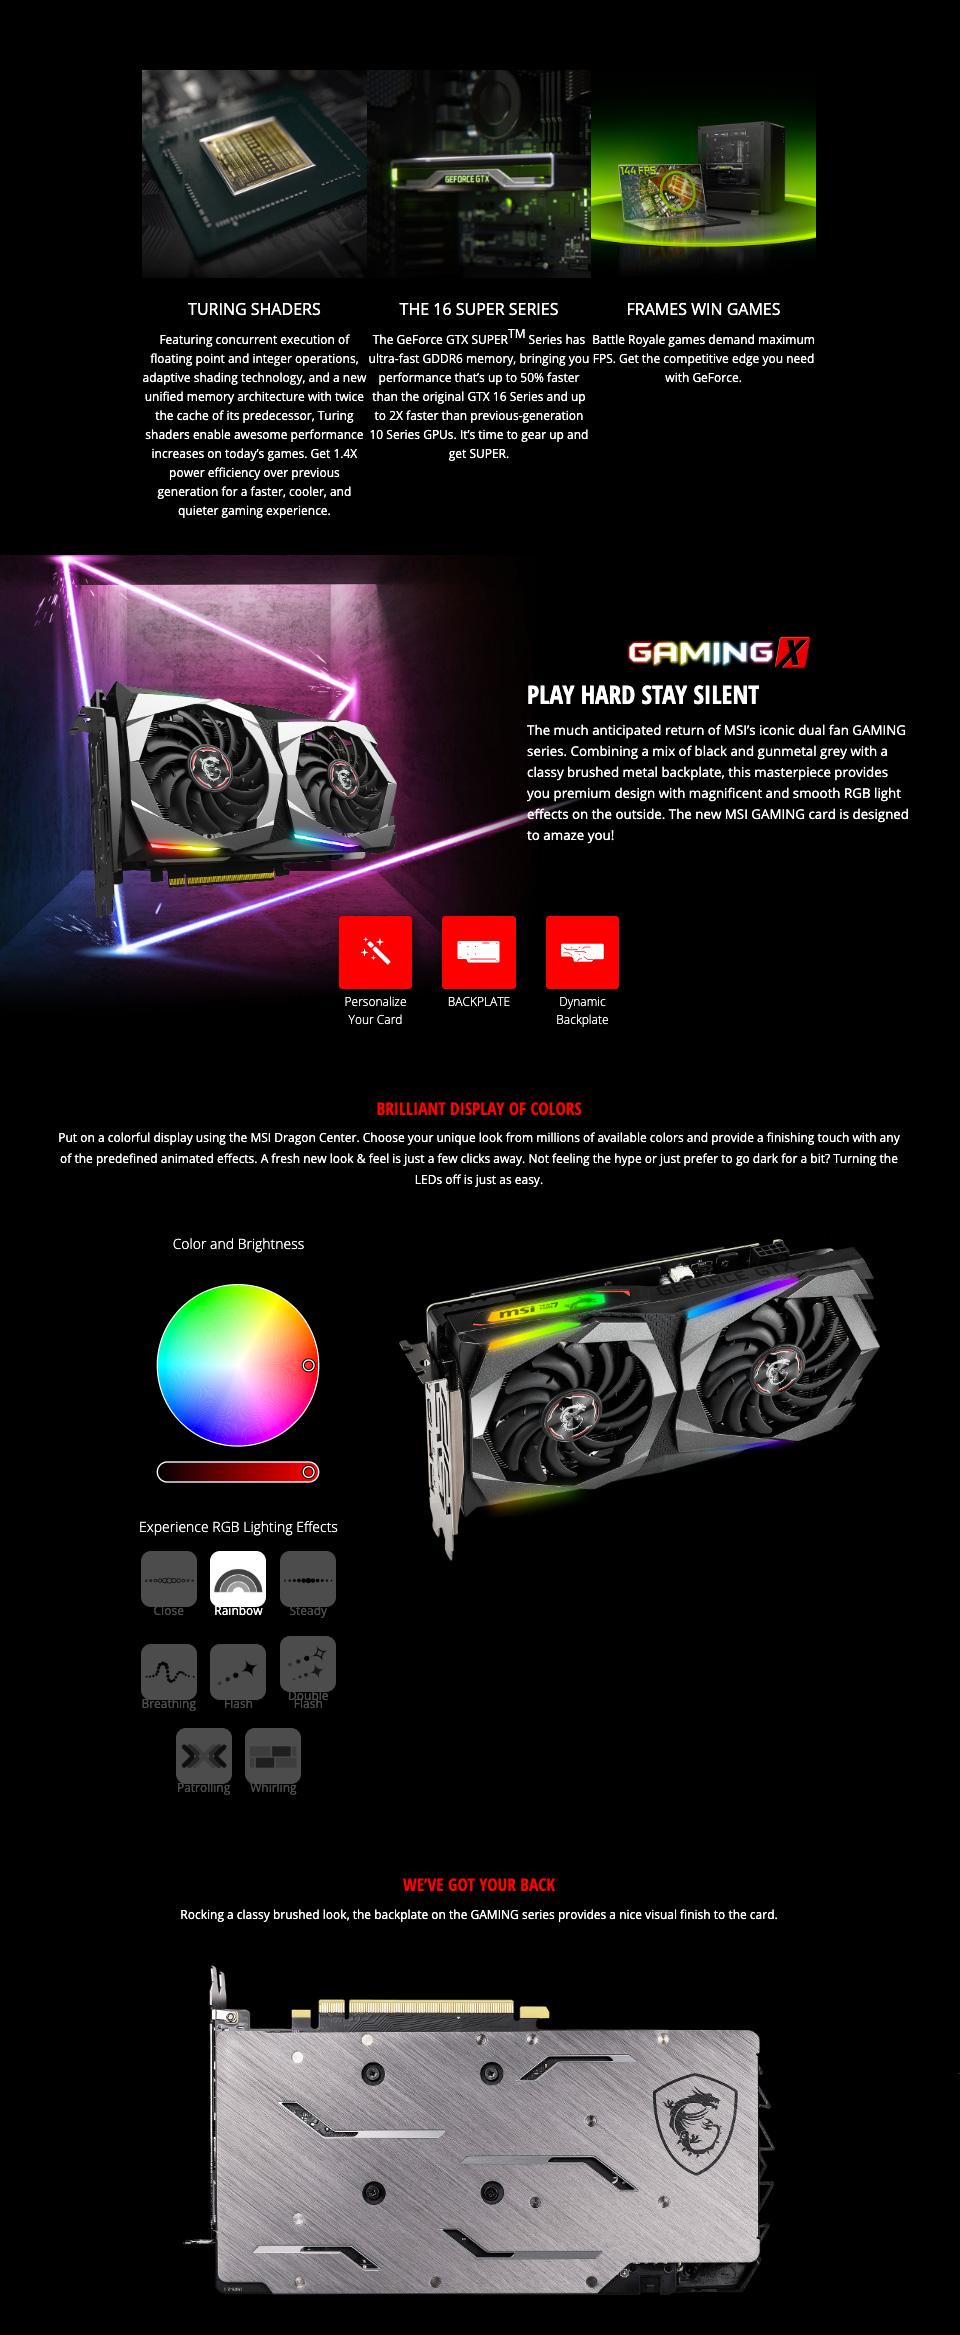 MSI GeForce GTX 1660 Super Gaming X 6GB features